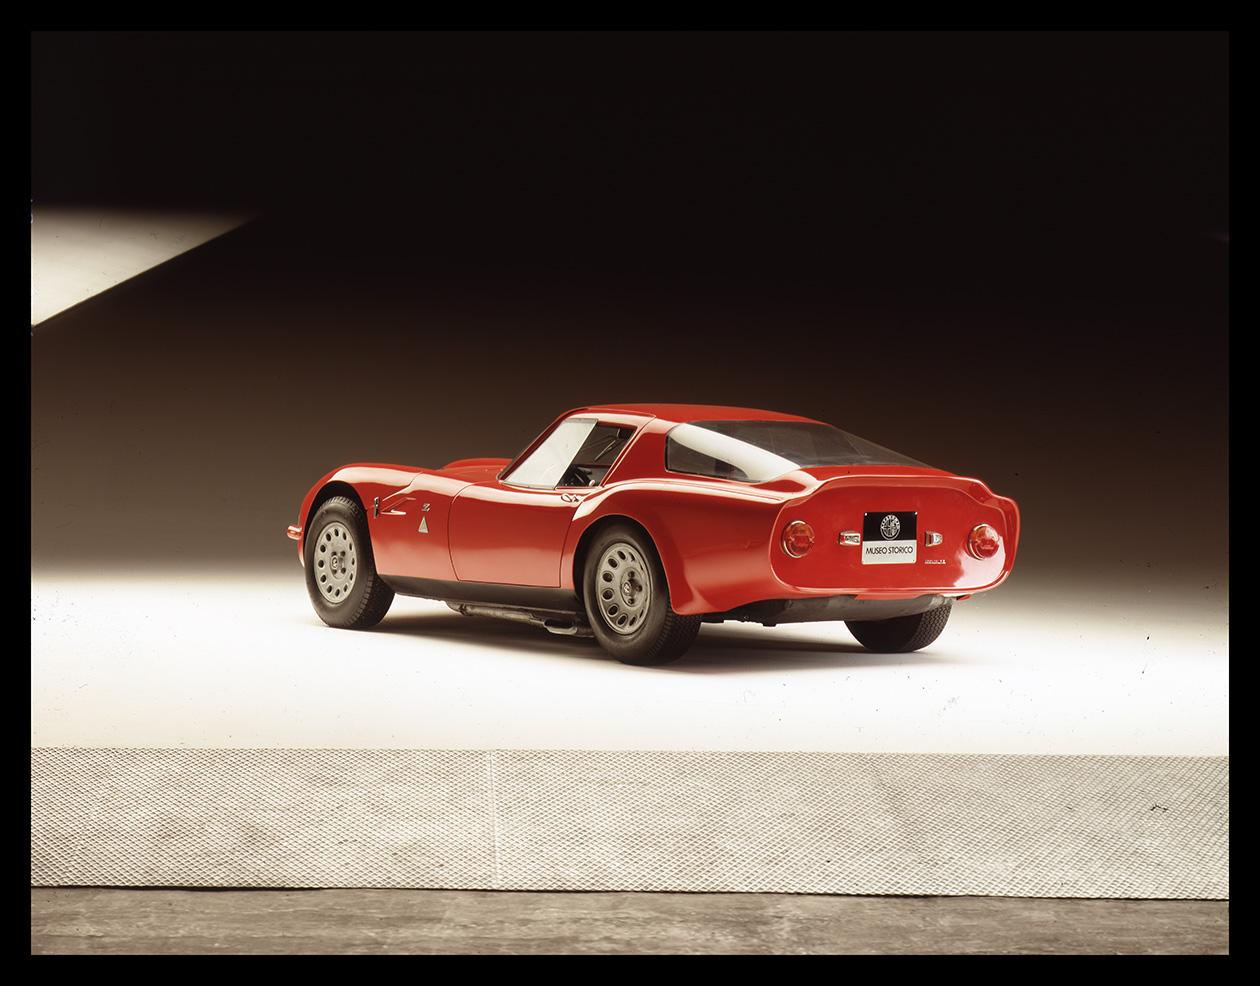 Giulia TZ Δεν γνωρίζεις τι εστί Alfa Romeo άμα δεν γνωρίζεις την ιστορία της Alfa, alfa romeo, Alfa Romeo Soul, Alfisti, Giulia, Heritage, museoalfaromeo, videos, zblog